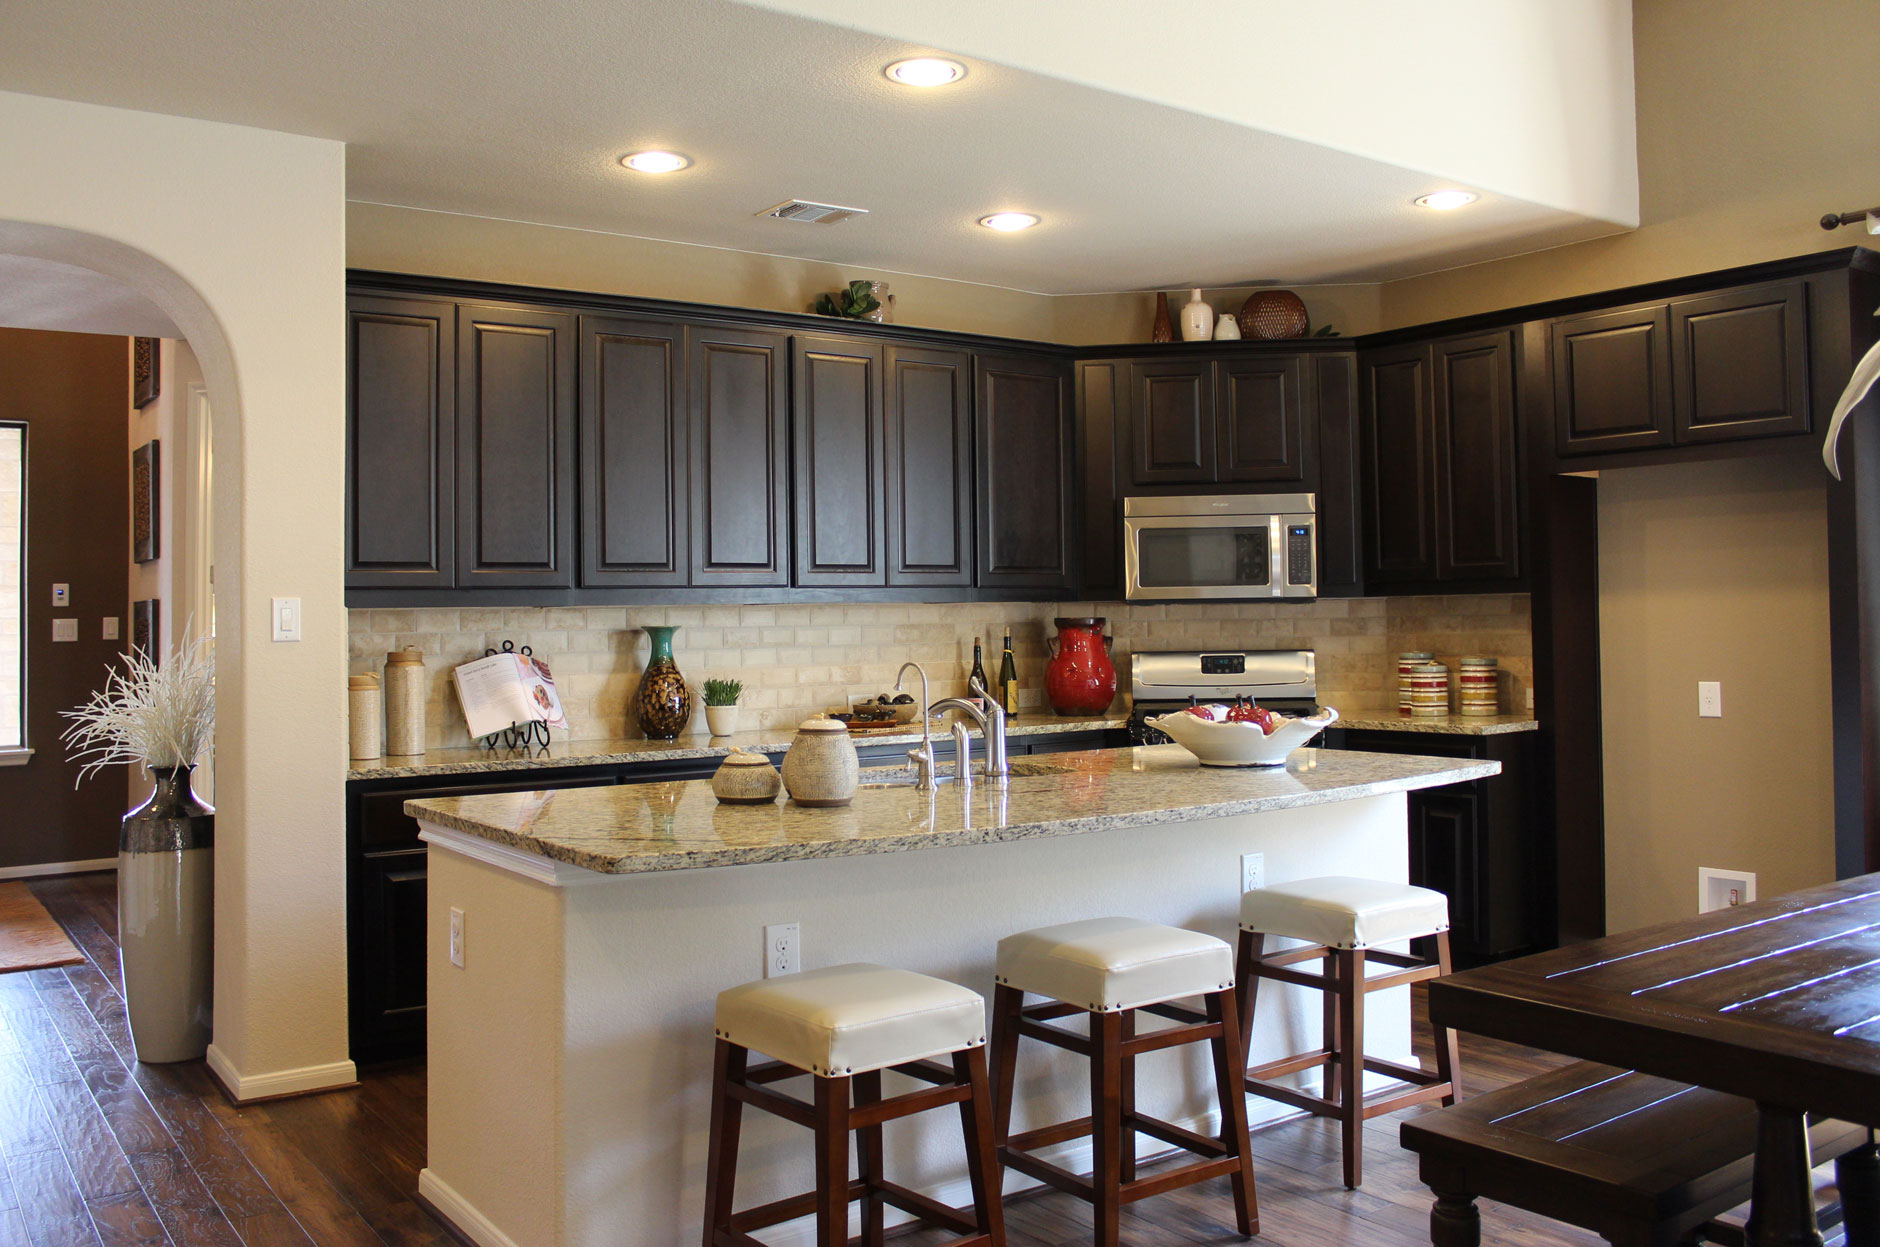 Dark Brown Kitchen Cabinets By Burrows Cabinets In Espresso